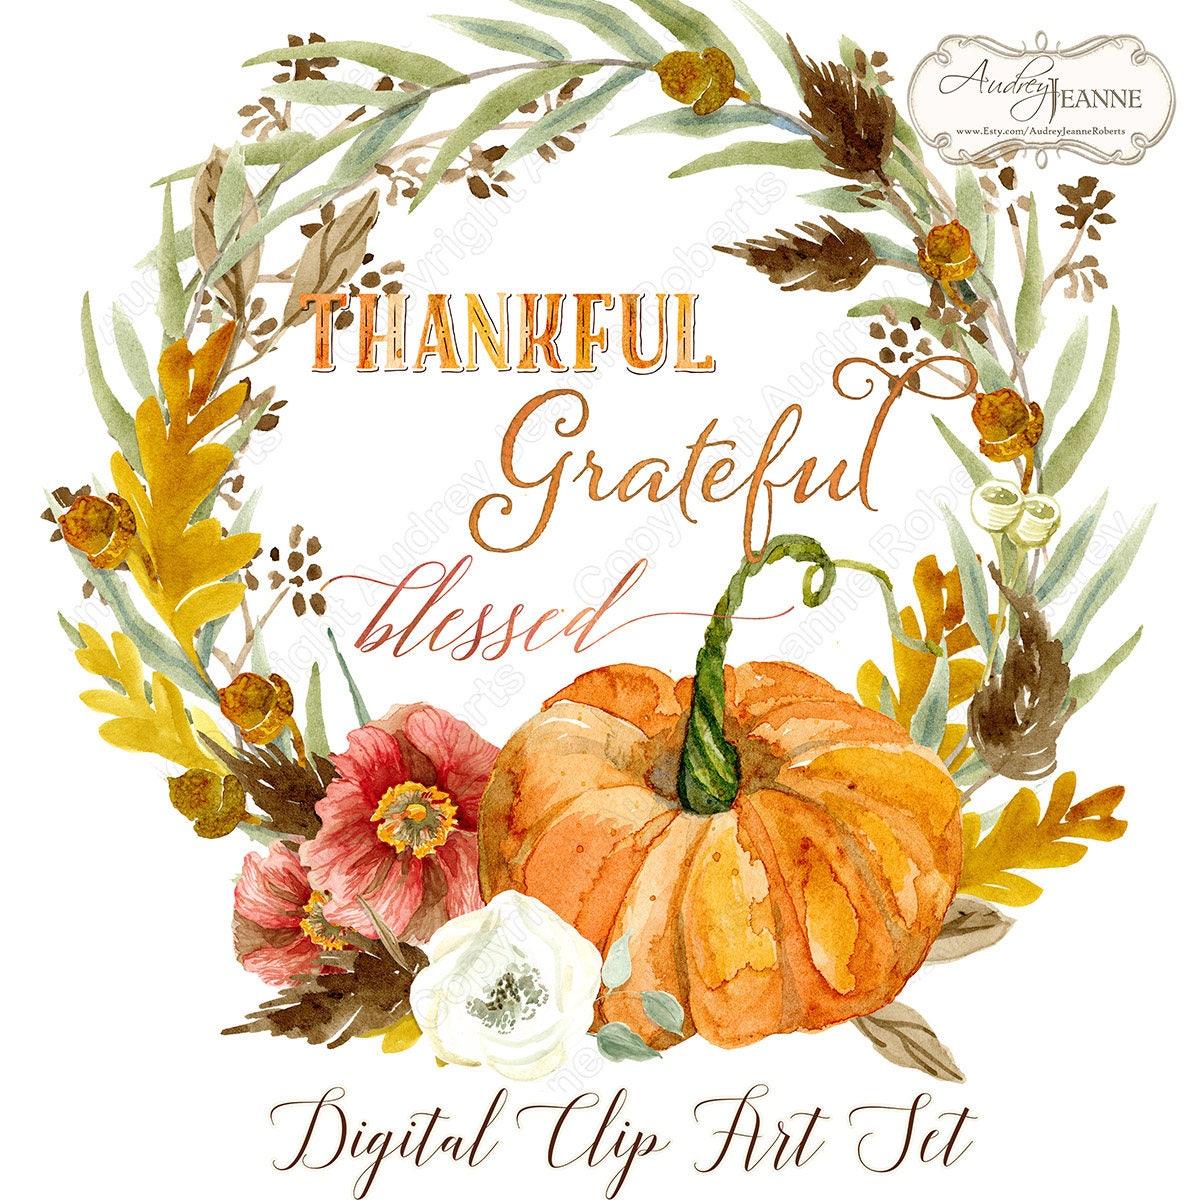 Watercolor Fall Wreath Digital Clip Art Pumpkin Autumn   Etsy